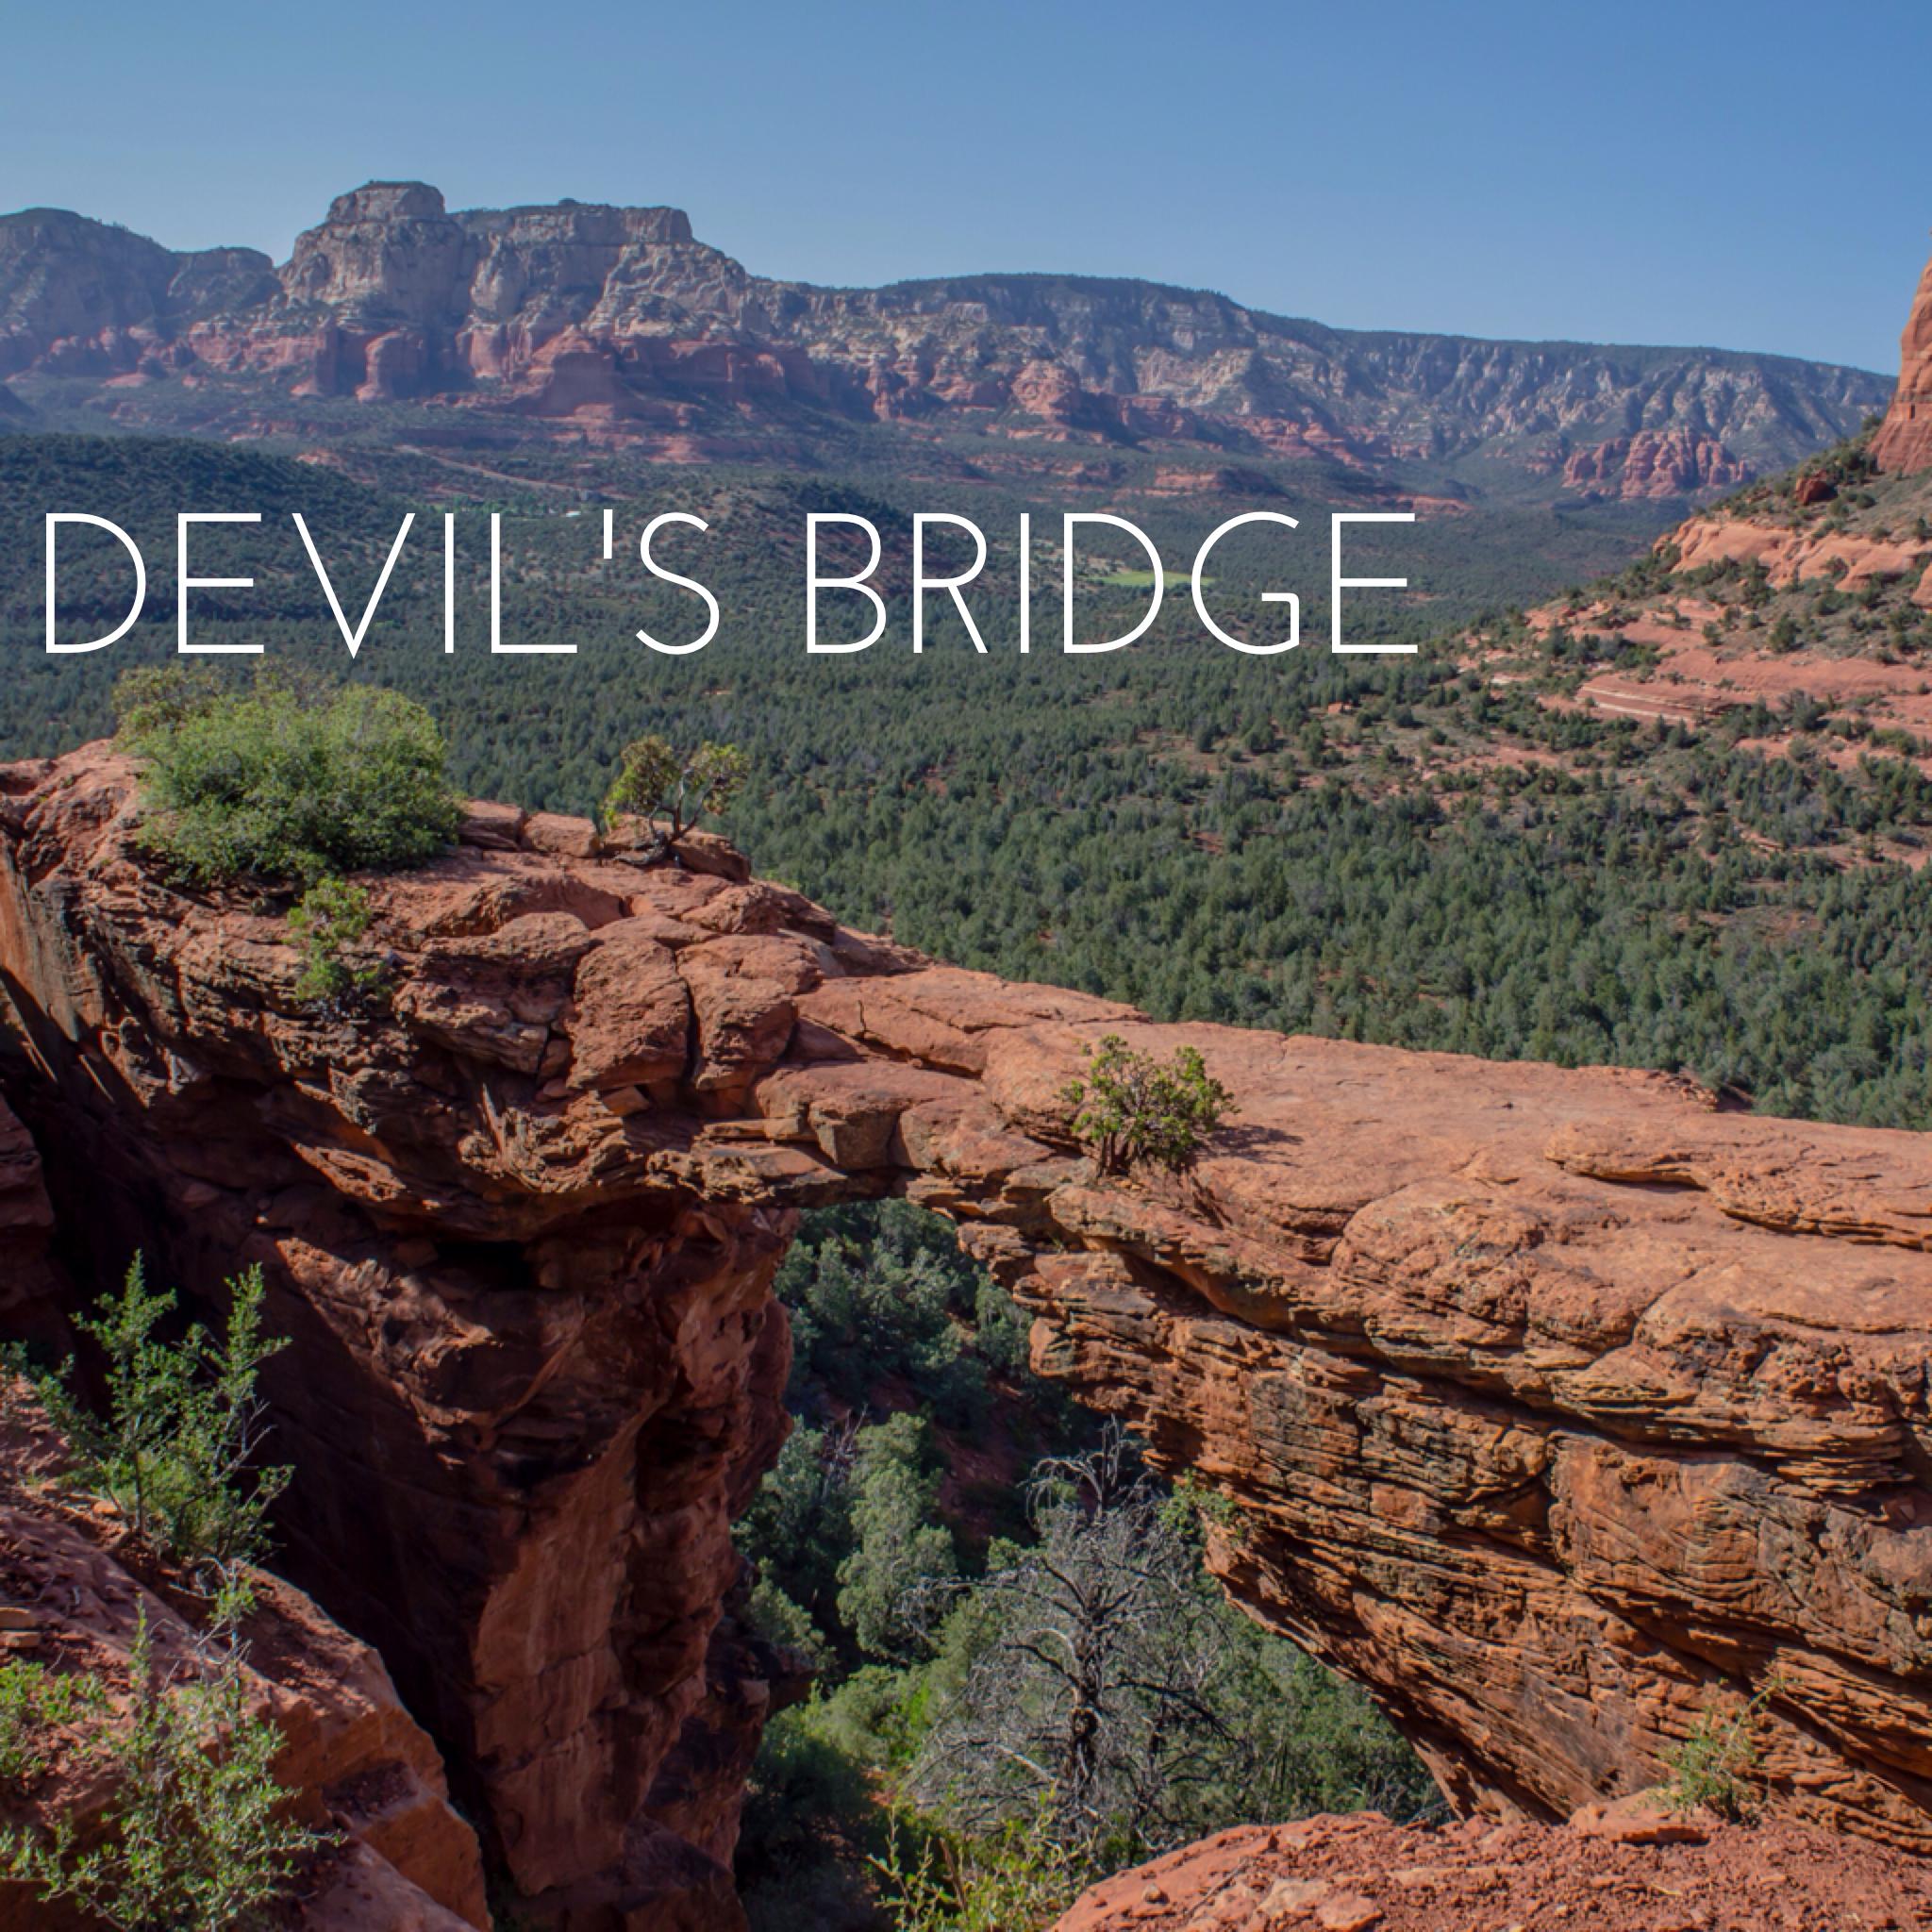 DevilsBridgeTitle.jpg